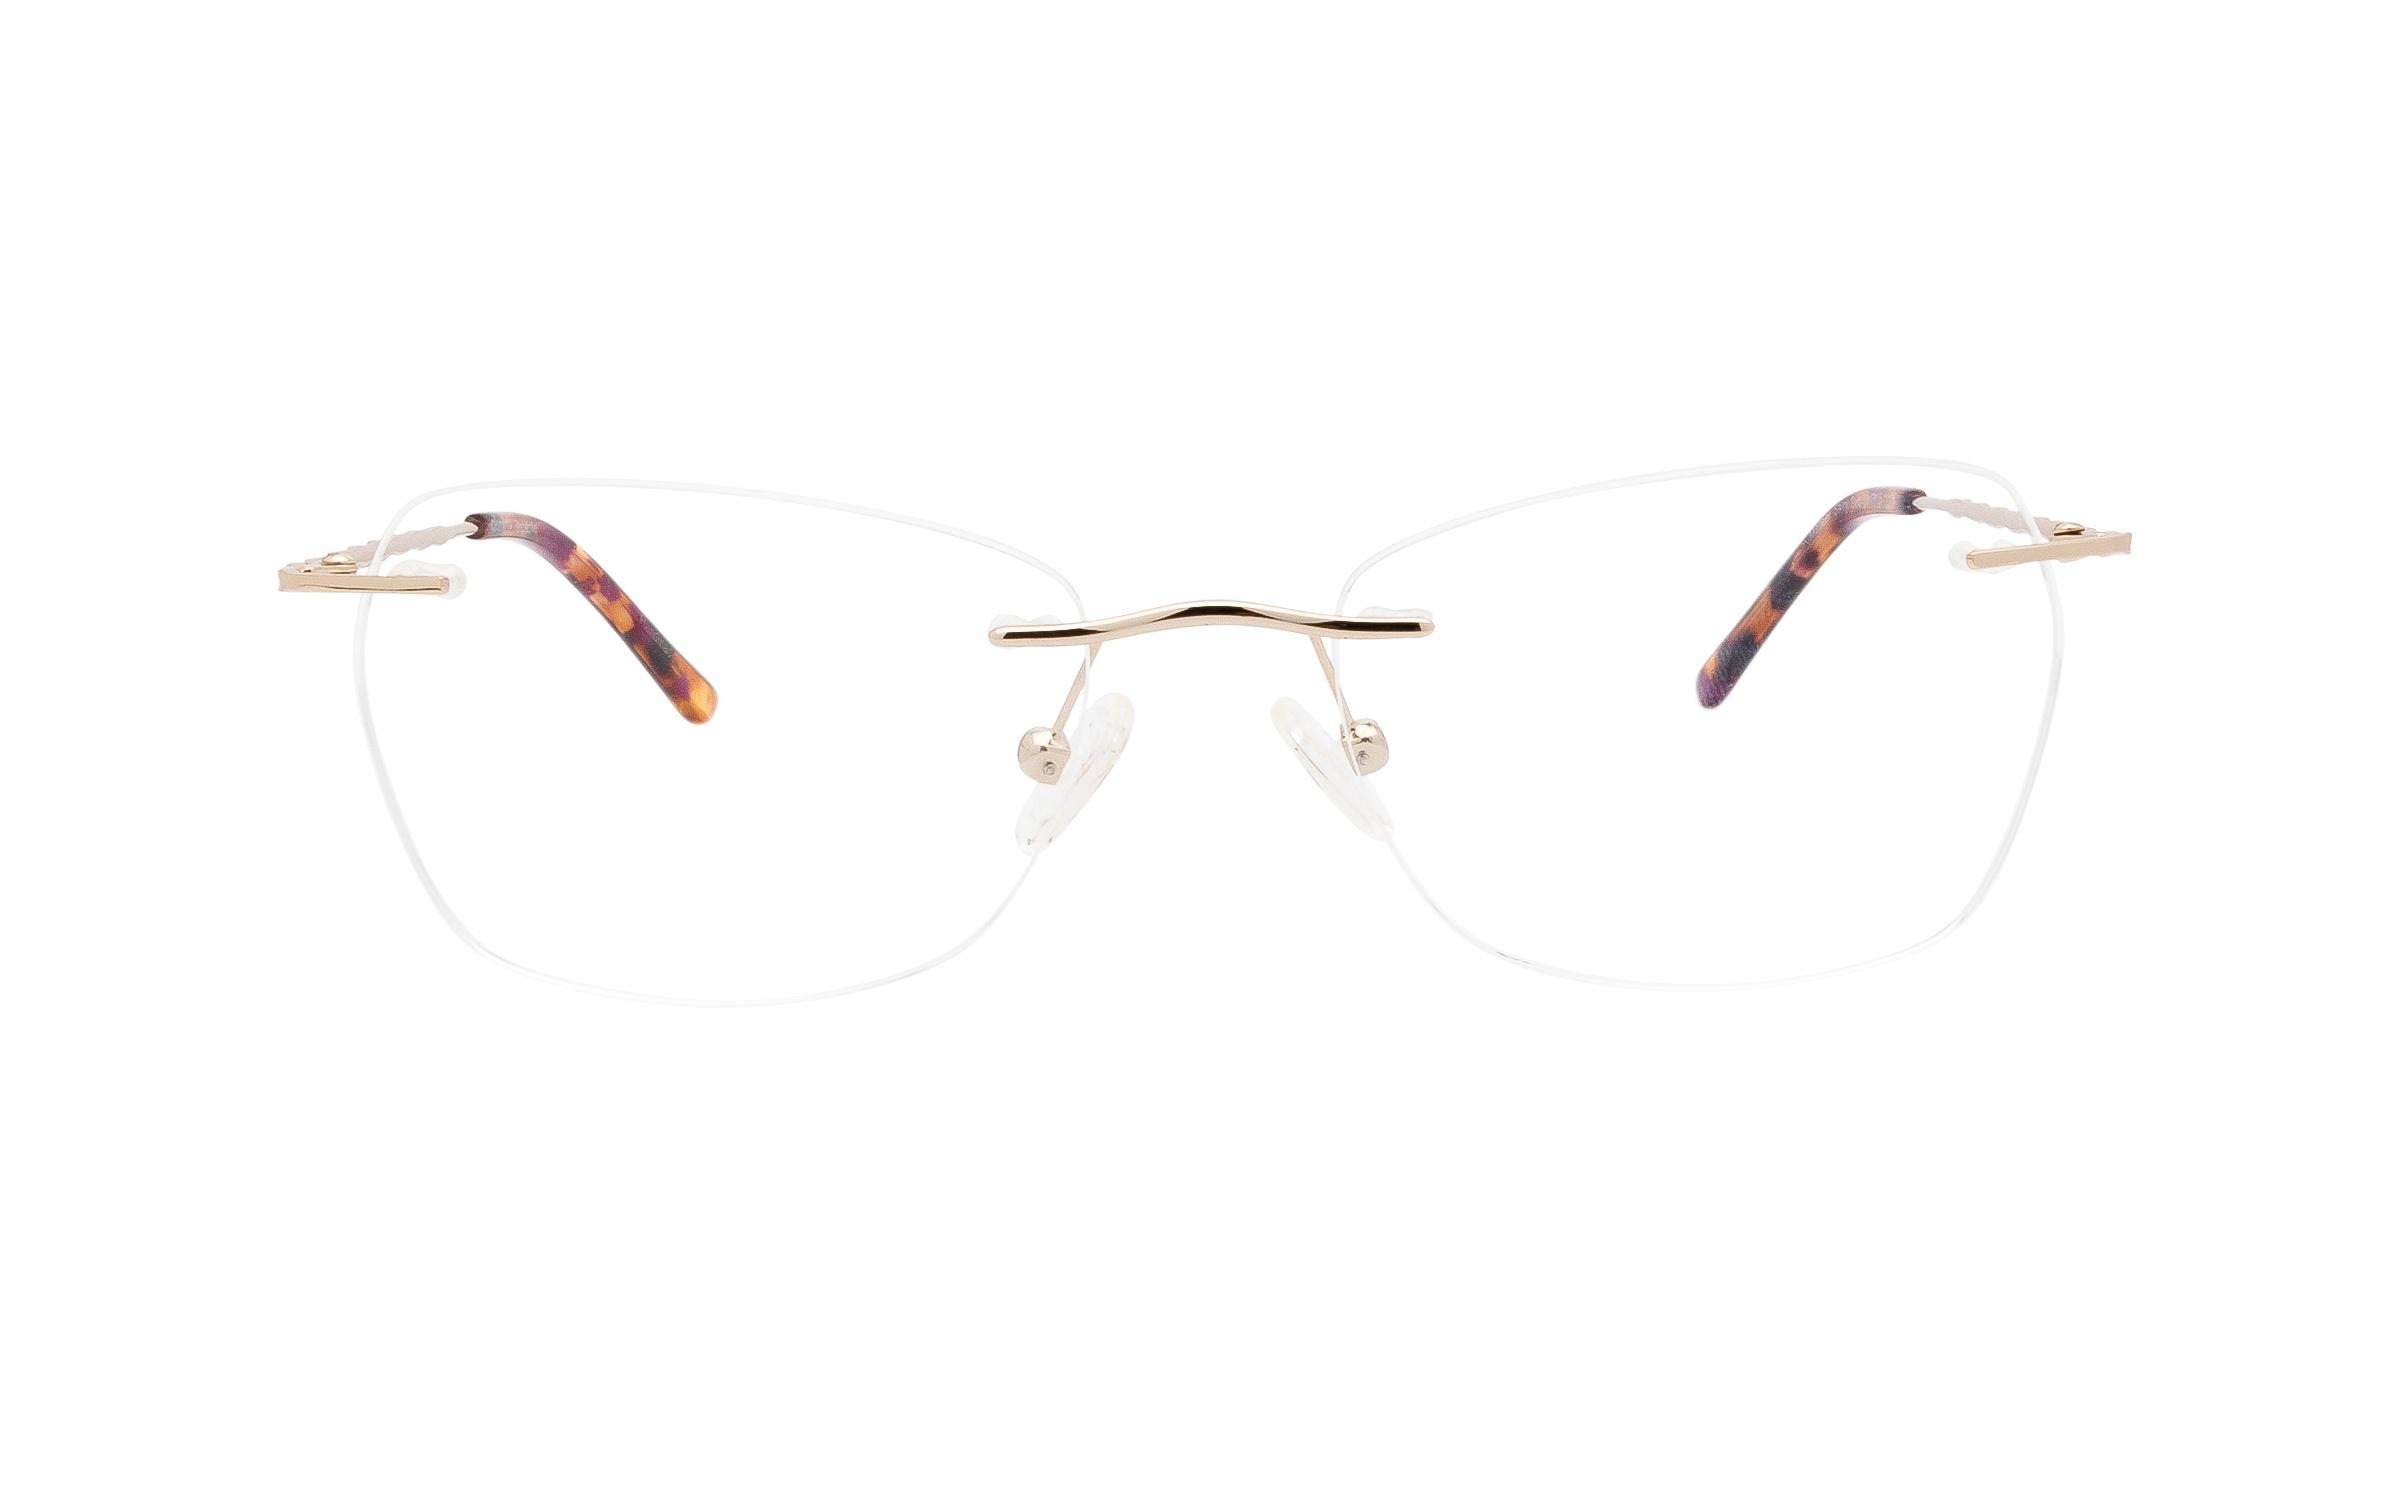 http://www.coastal.com/ - Perspective Meteor PER017 C01 (53) Eyeglasses and Frame in Shiny Gold | Acetate/Metal – Online Coastal